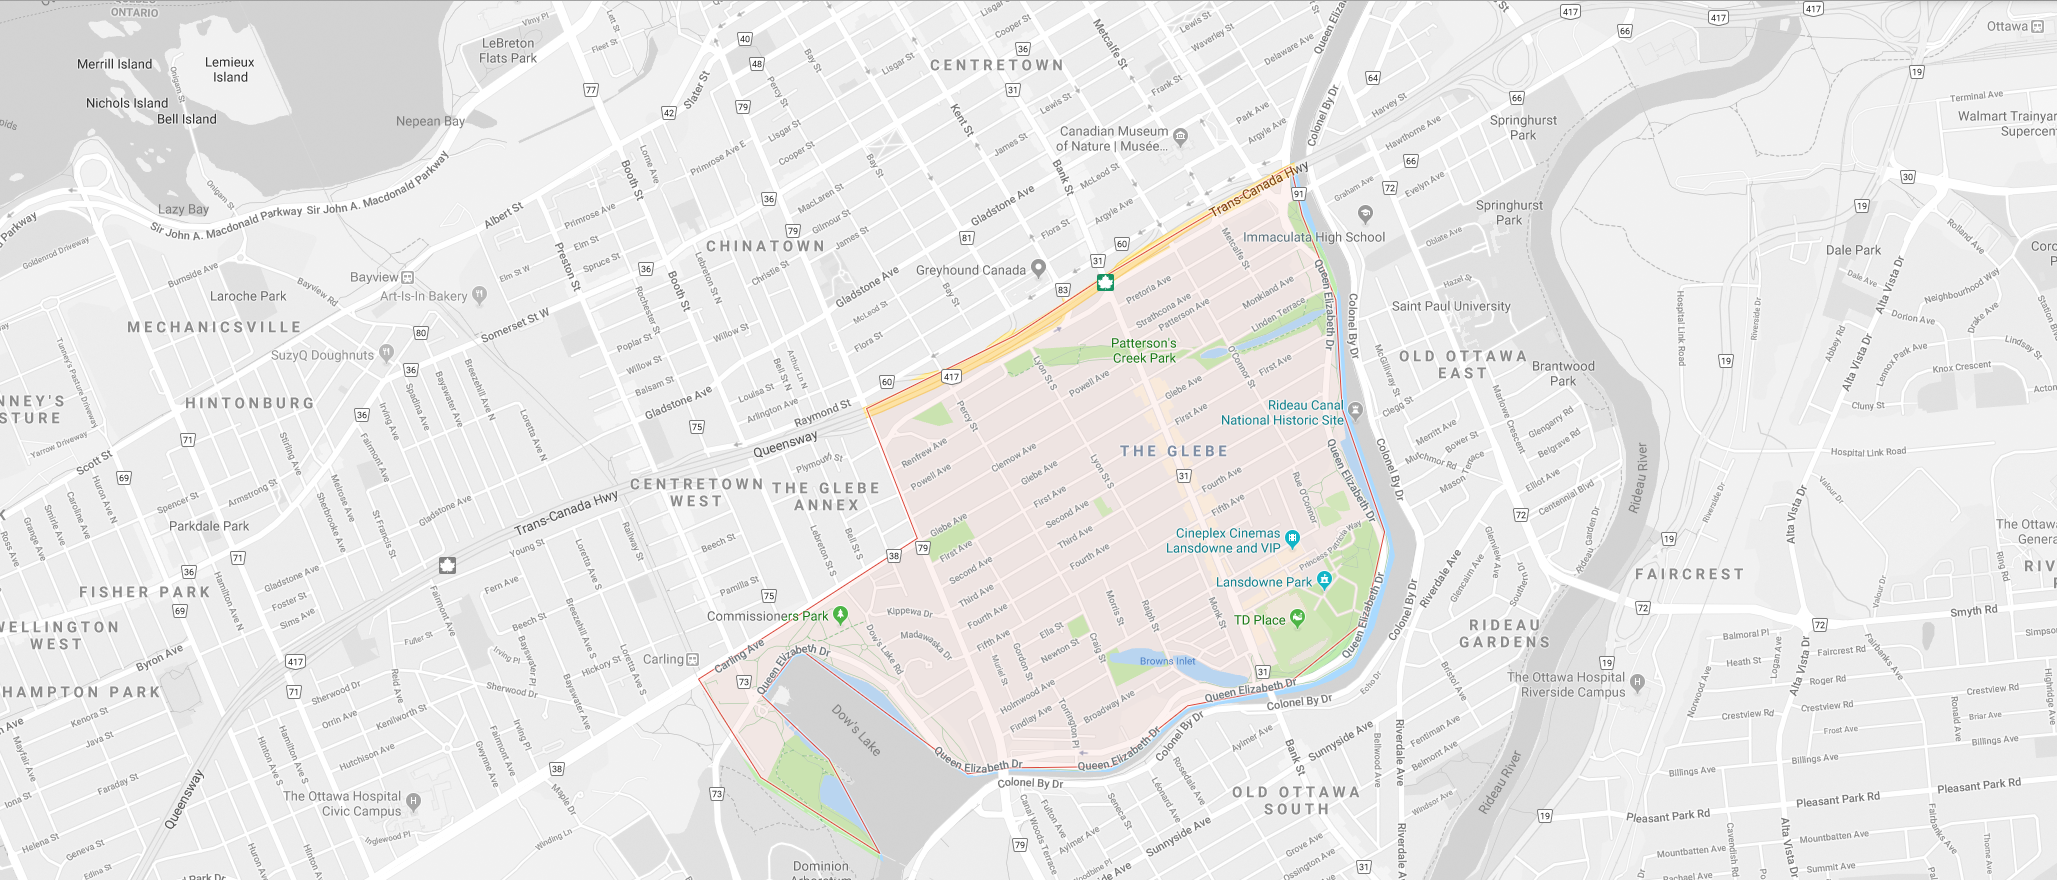 the_glebe_Ottawa_Map_LyneandDominique.png